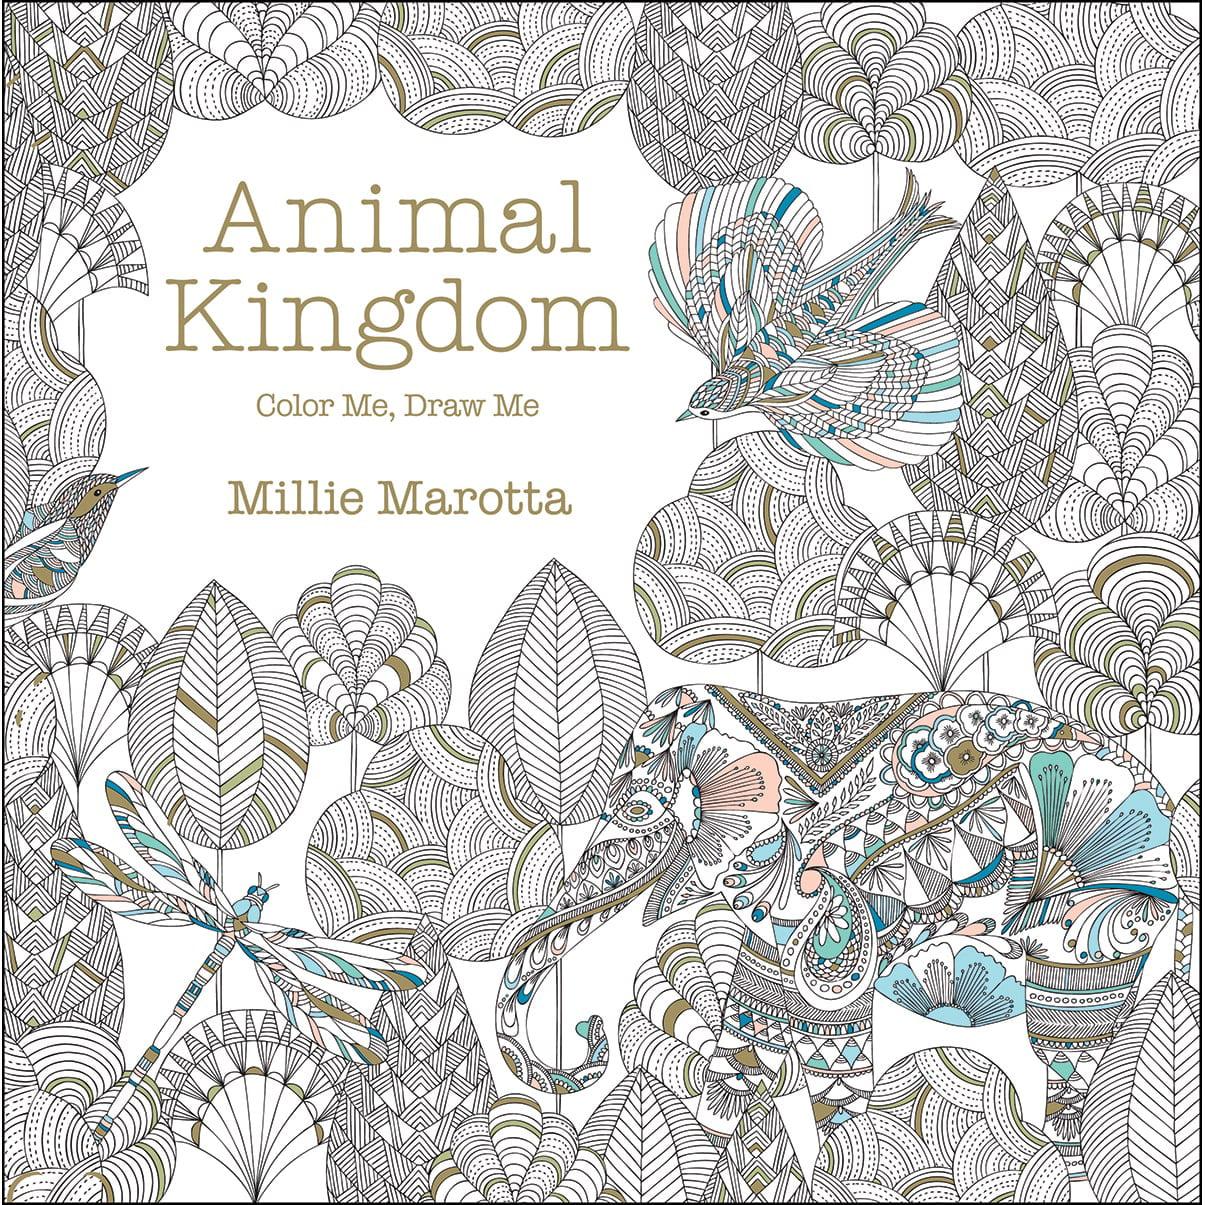 Color me draw me animal kingdom book - Color Me Draw Me Animal Kingdom Book 1